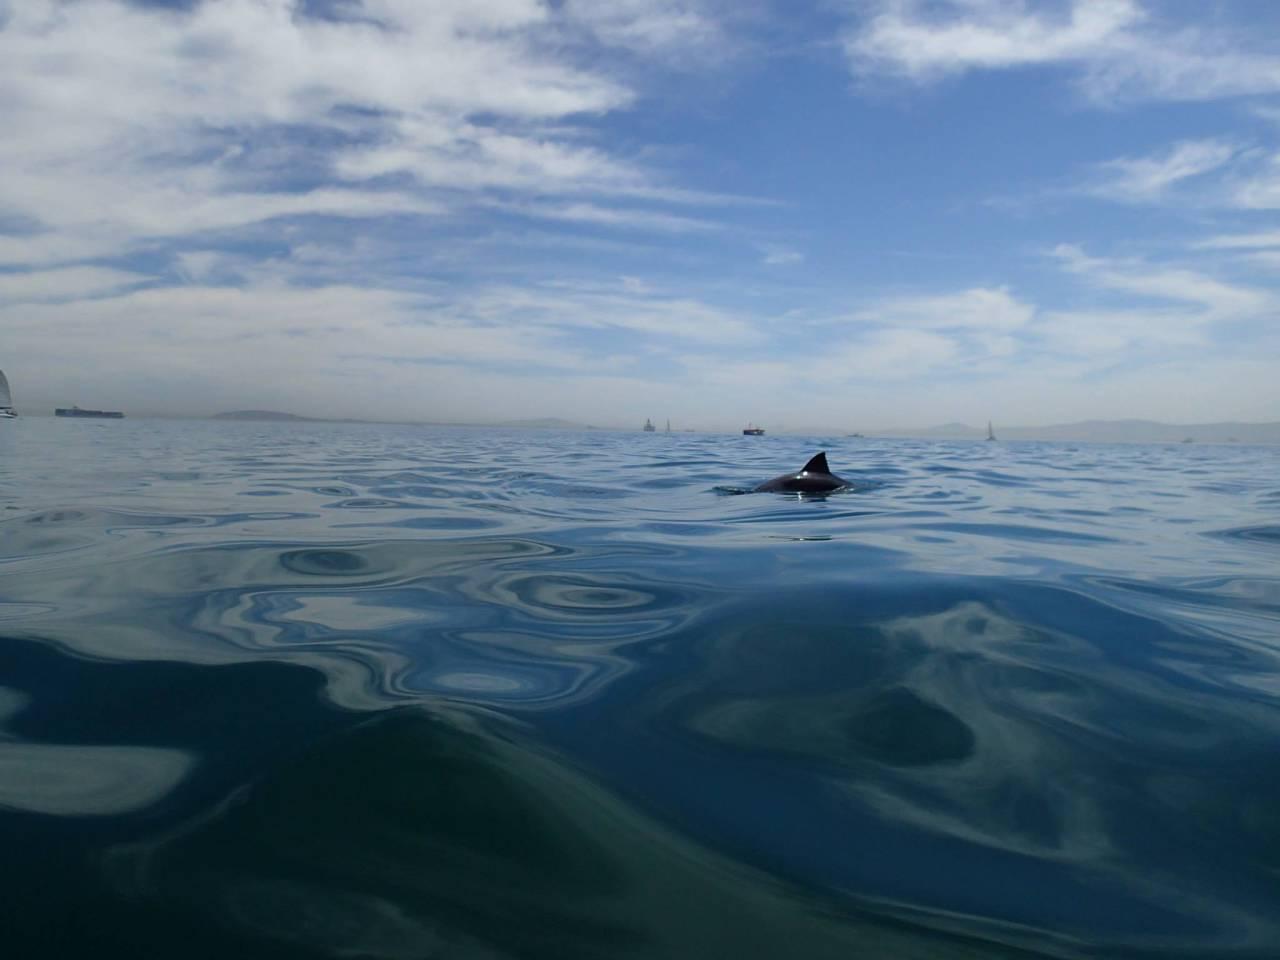 Kaskazi Kayaks